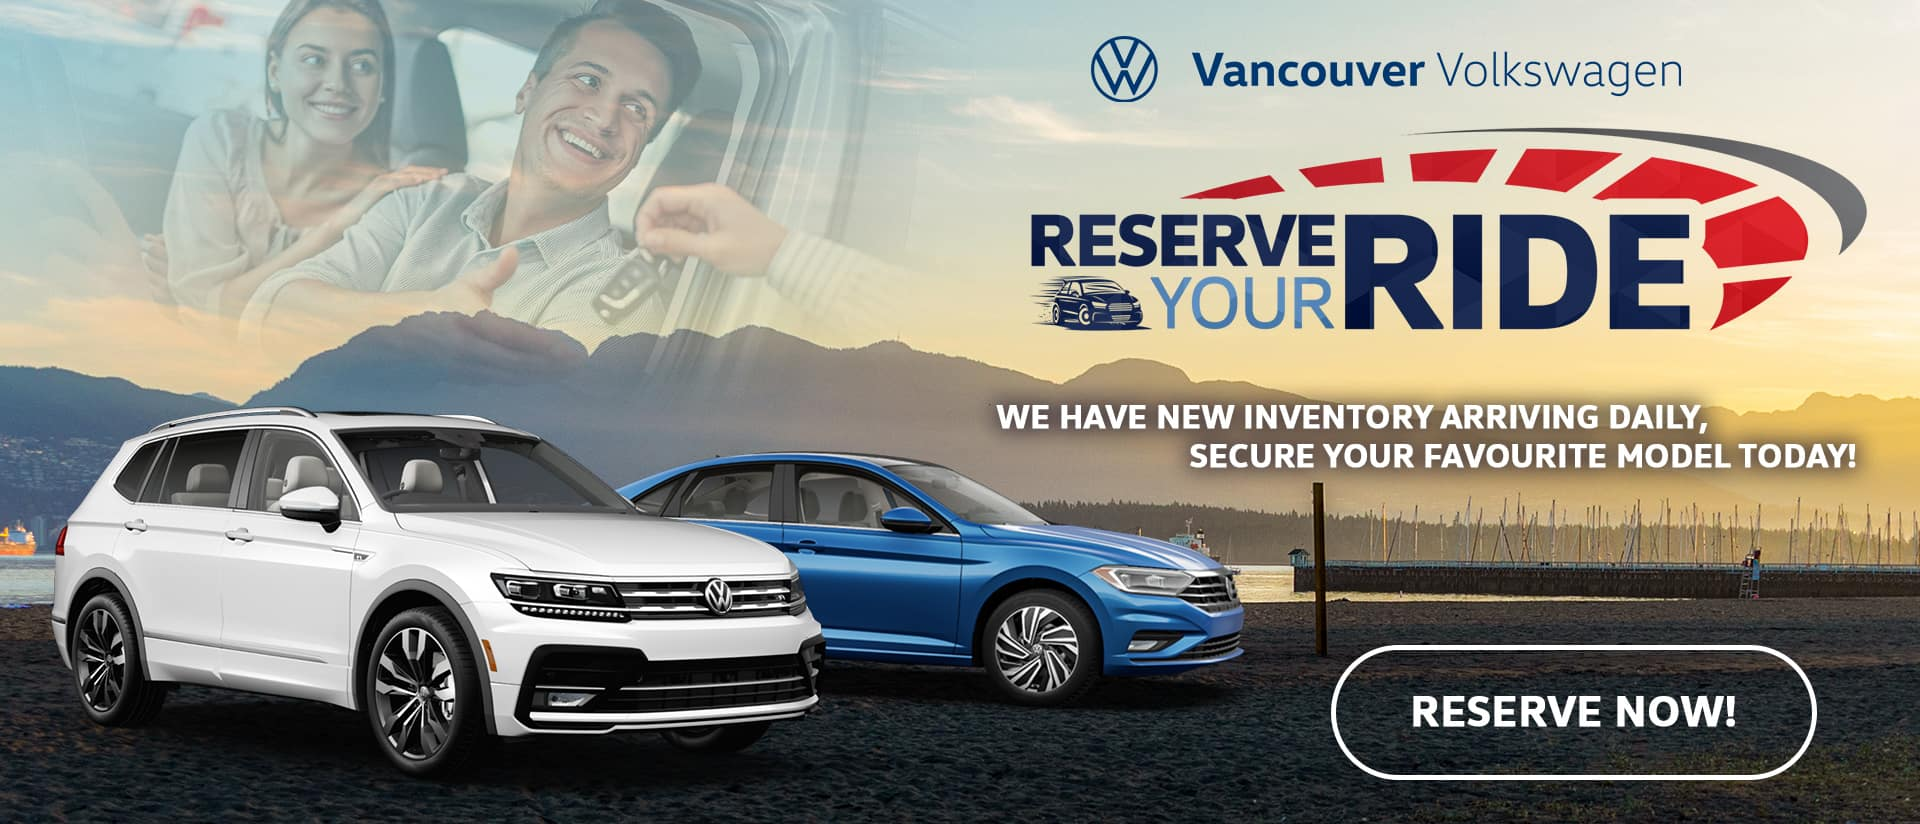 Reserve your ride Vancouver Volkswagen